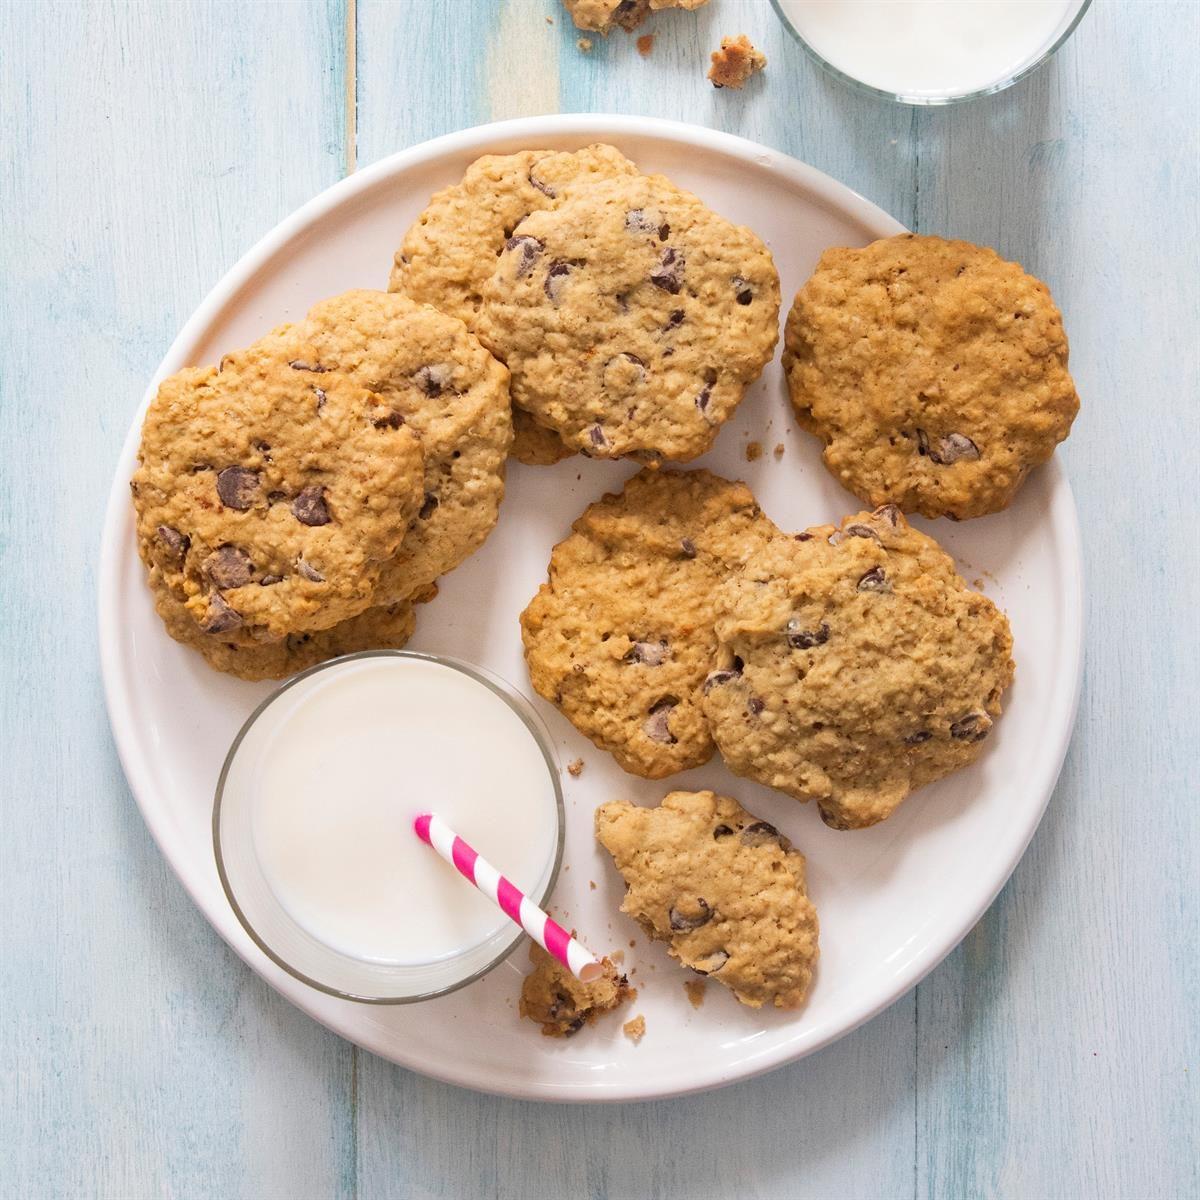 Sourdough Oatmeal Chocolate Chip Cookies